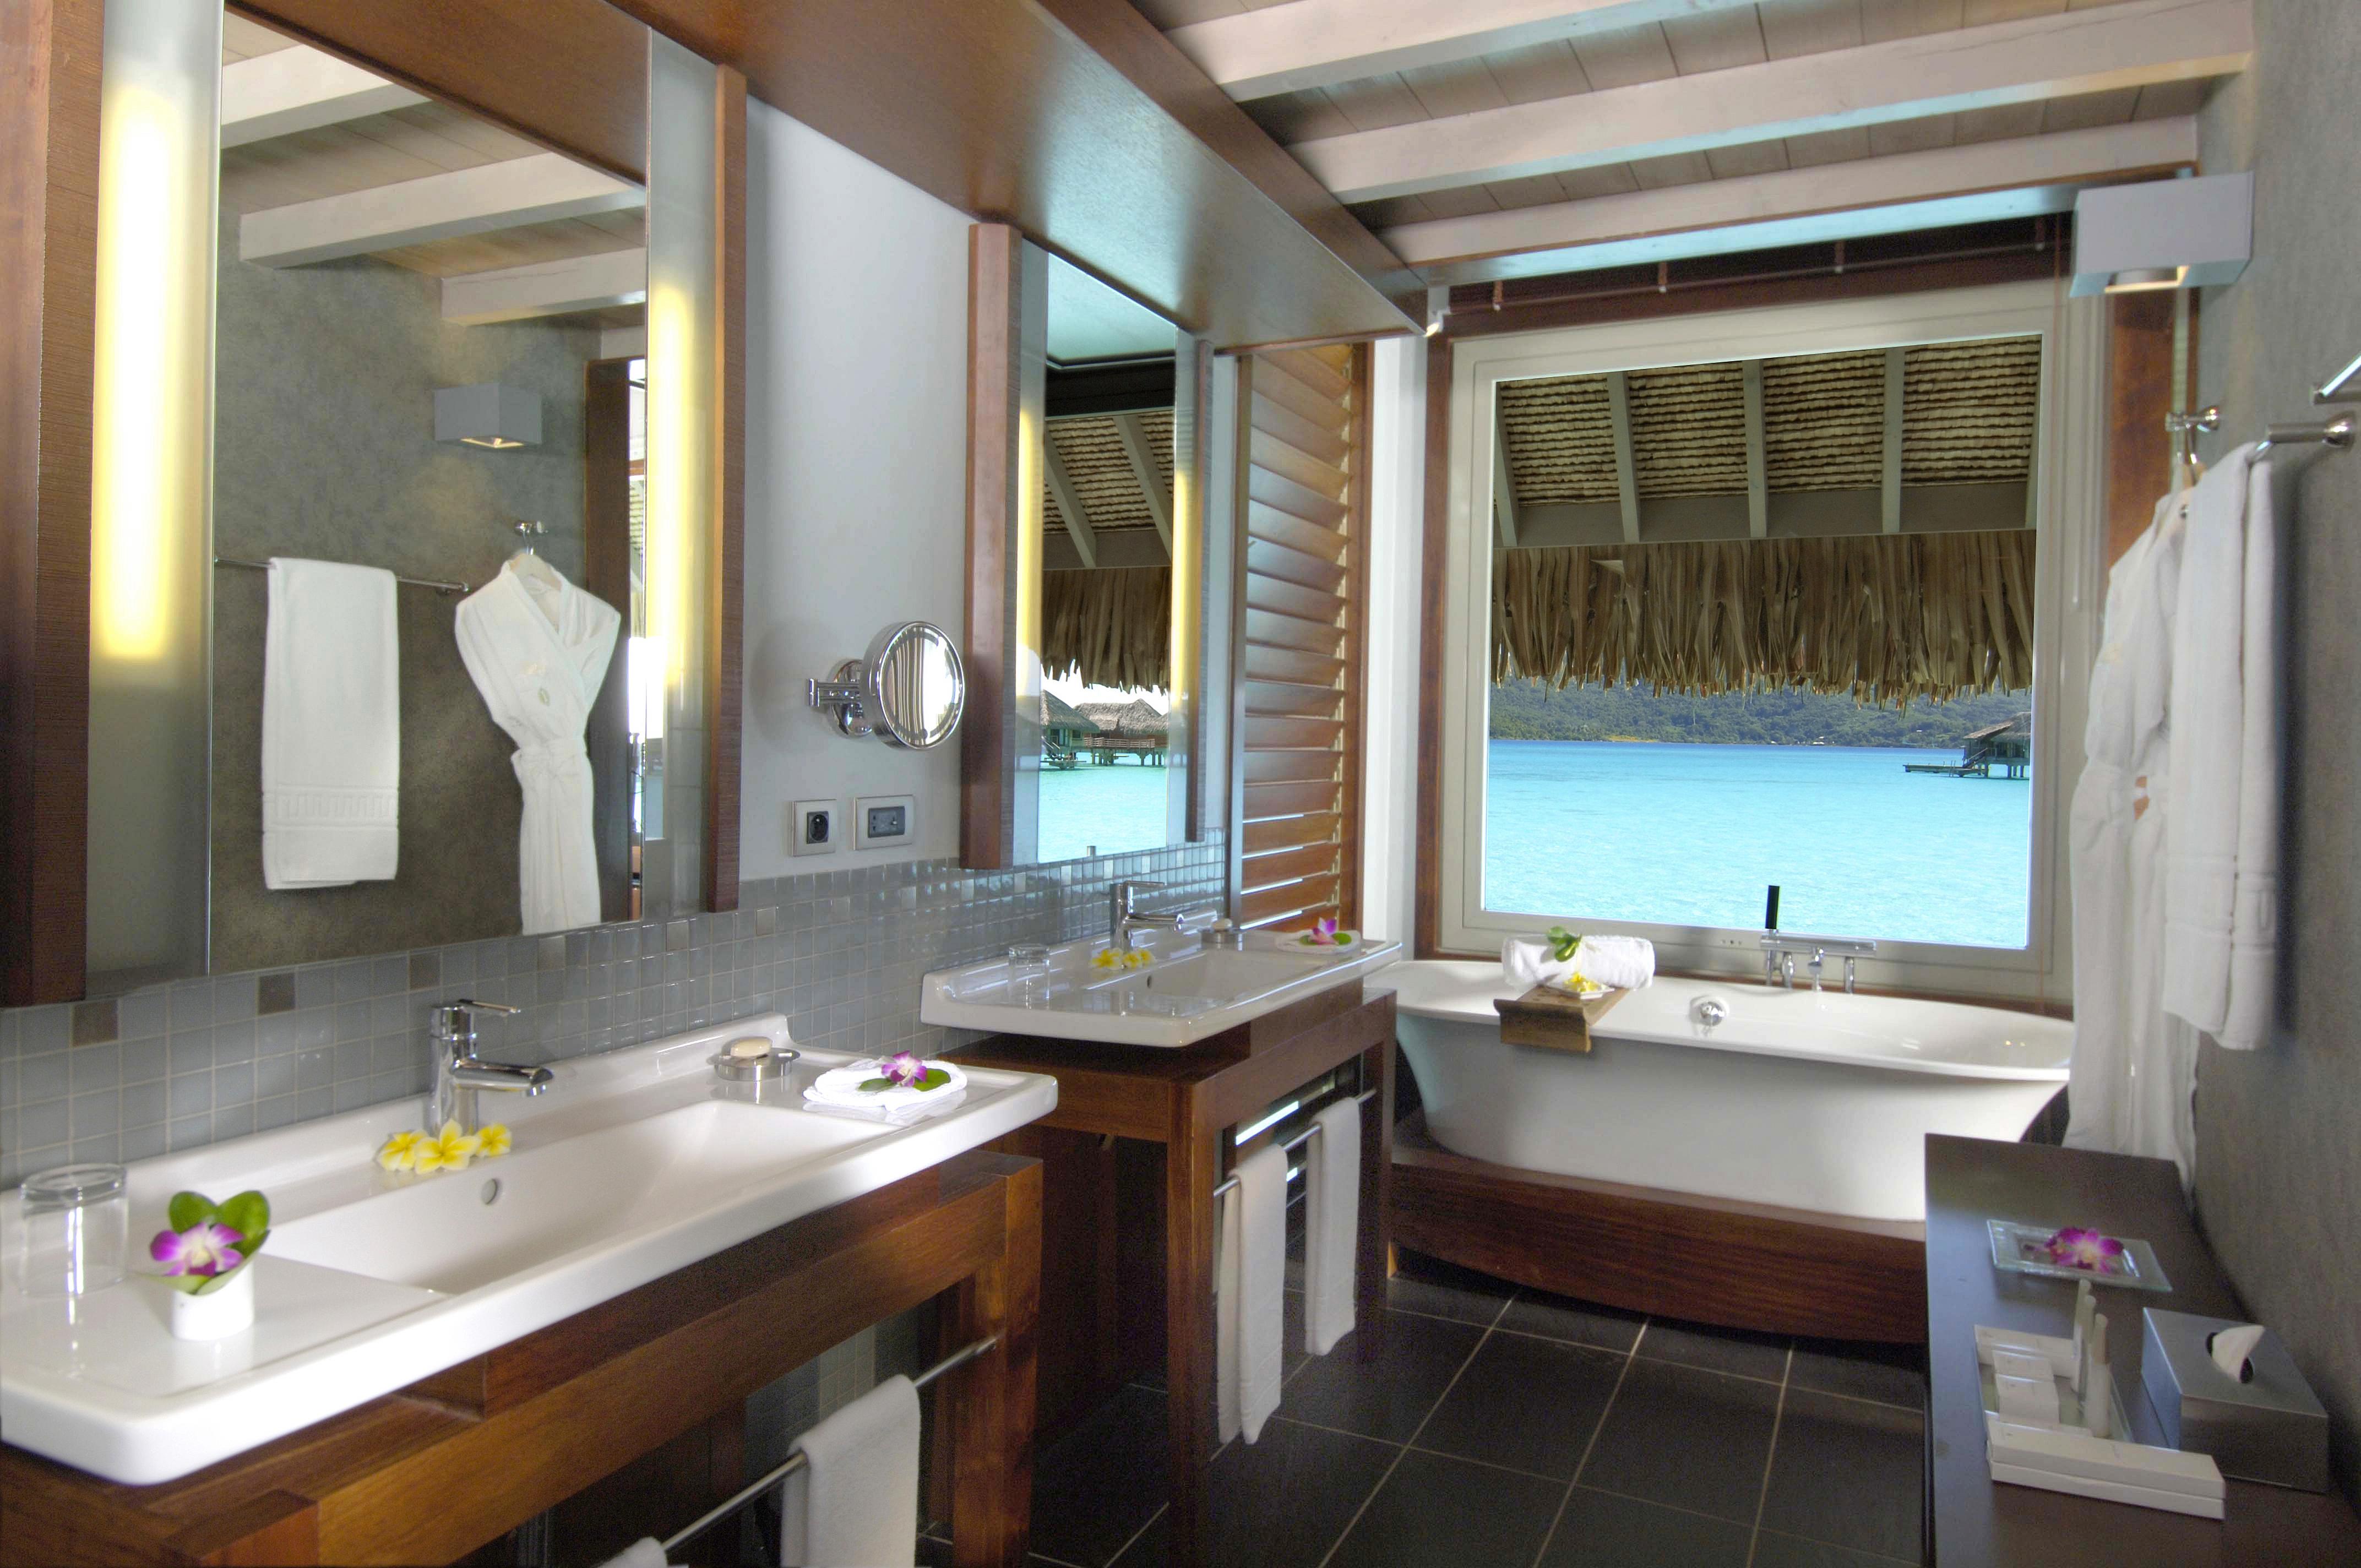 https://tahititourisme.com.au/wp-content/uploads/2017/10/Intercont-Thalasso-Bob-overwater-villas-bathroom.jpg